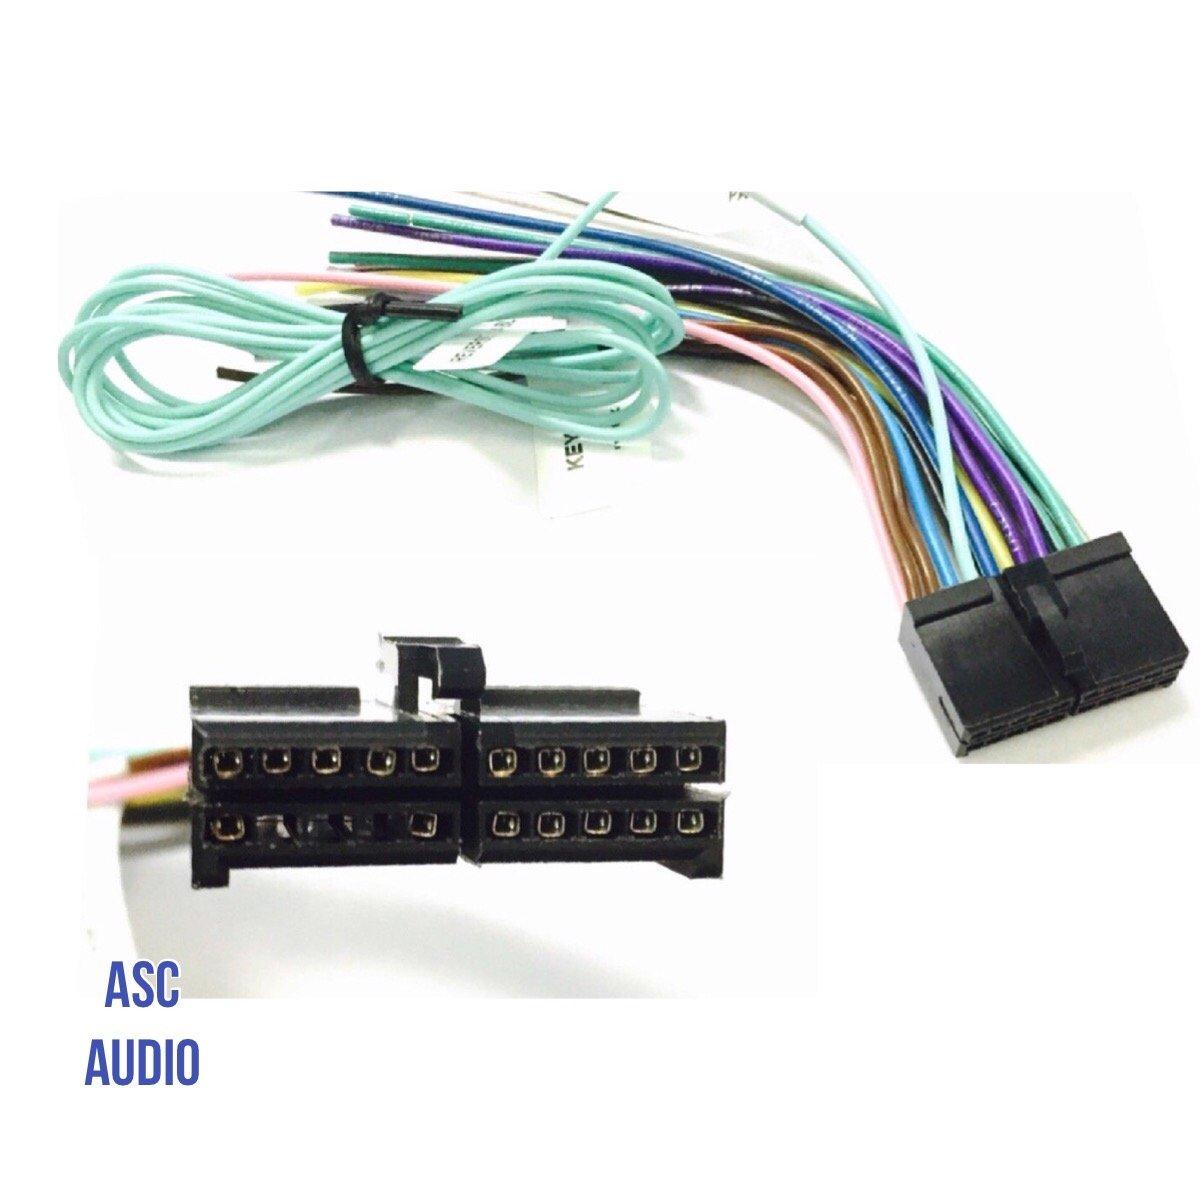 ASC Audio Car Stereo Radio Wire Harness Plug for select Boss 20 Pin Radios DVD Nav- BV9973 BV9978 BV9979B BV9980BT and more...